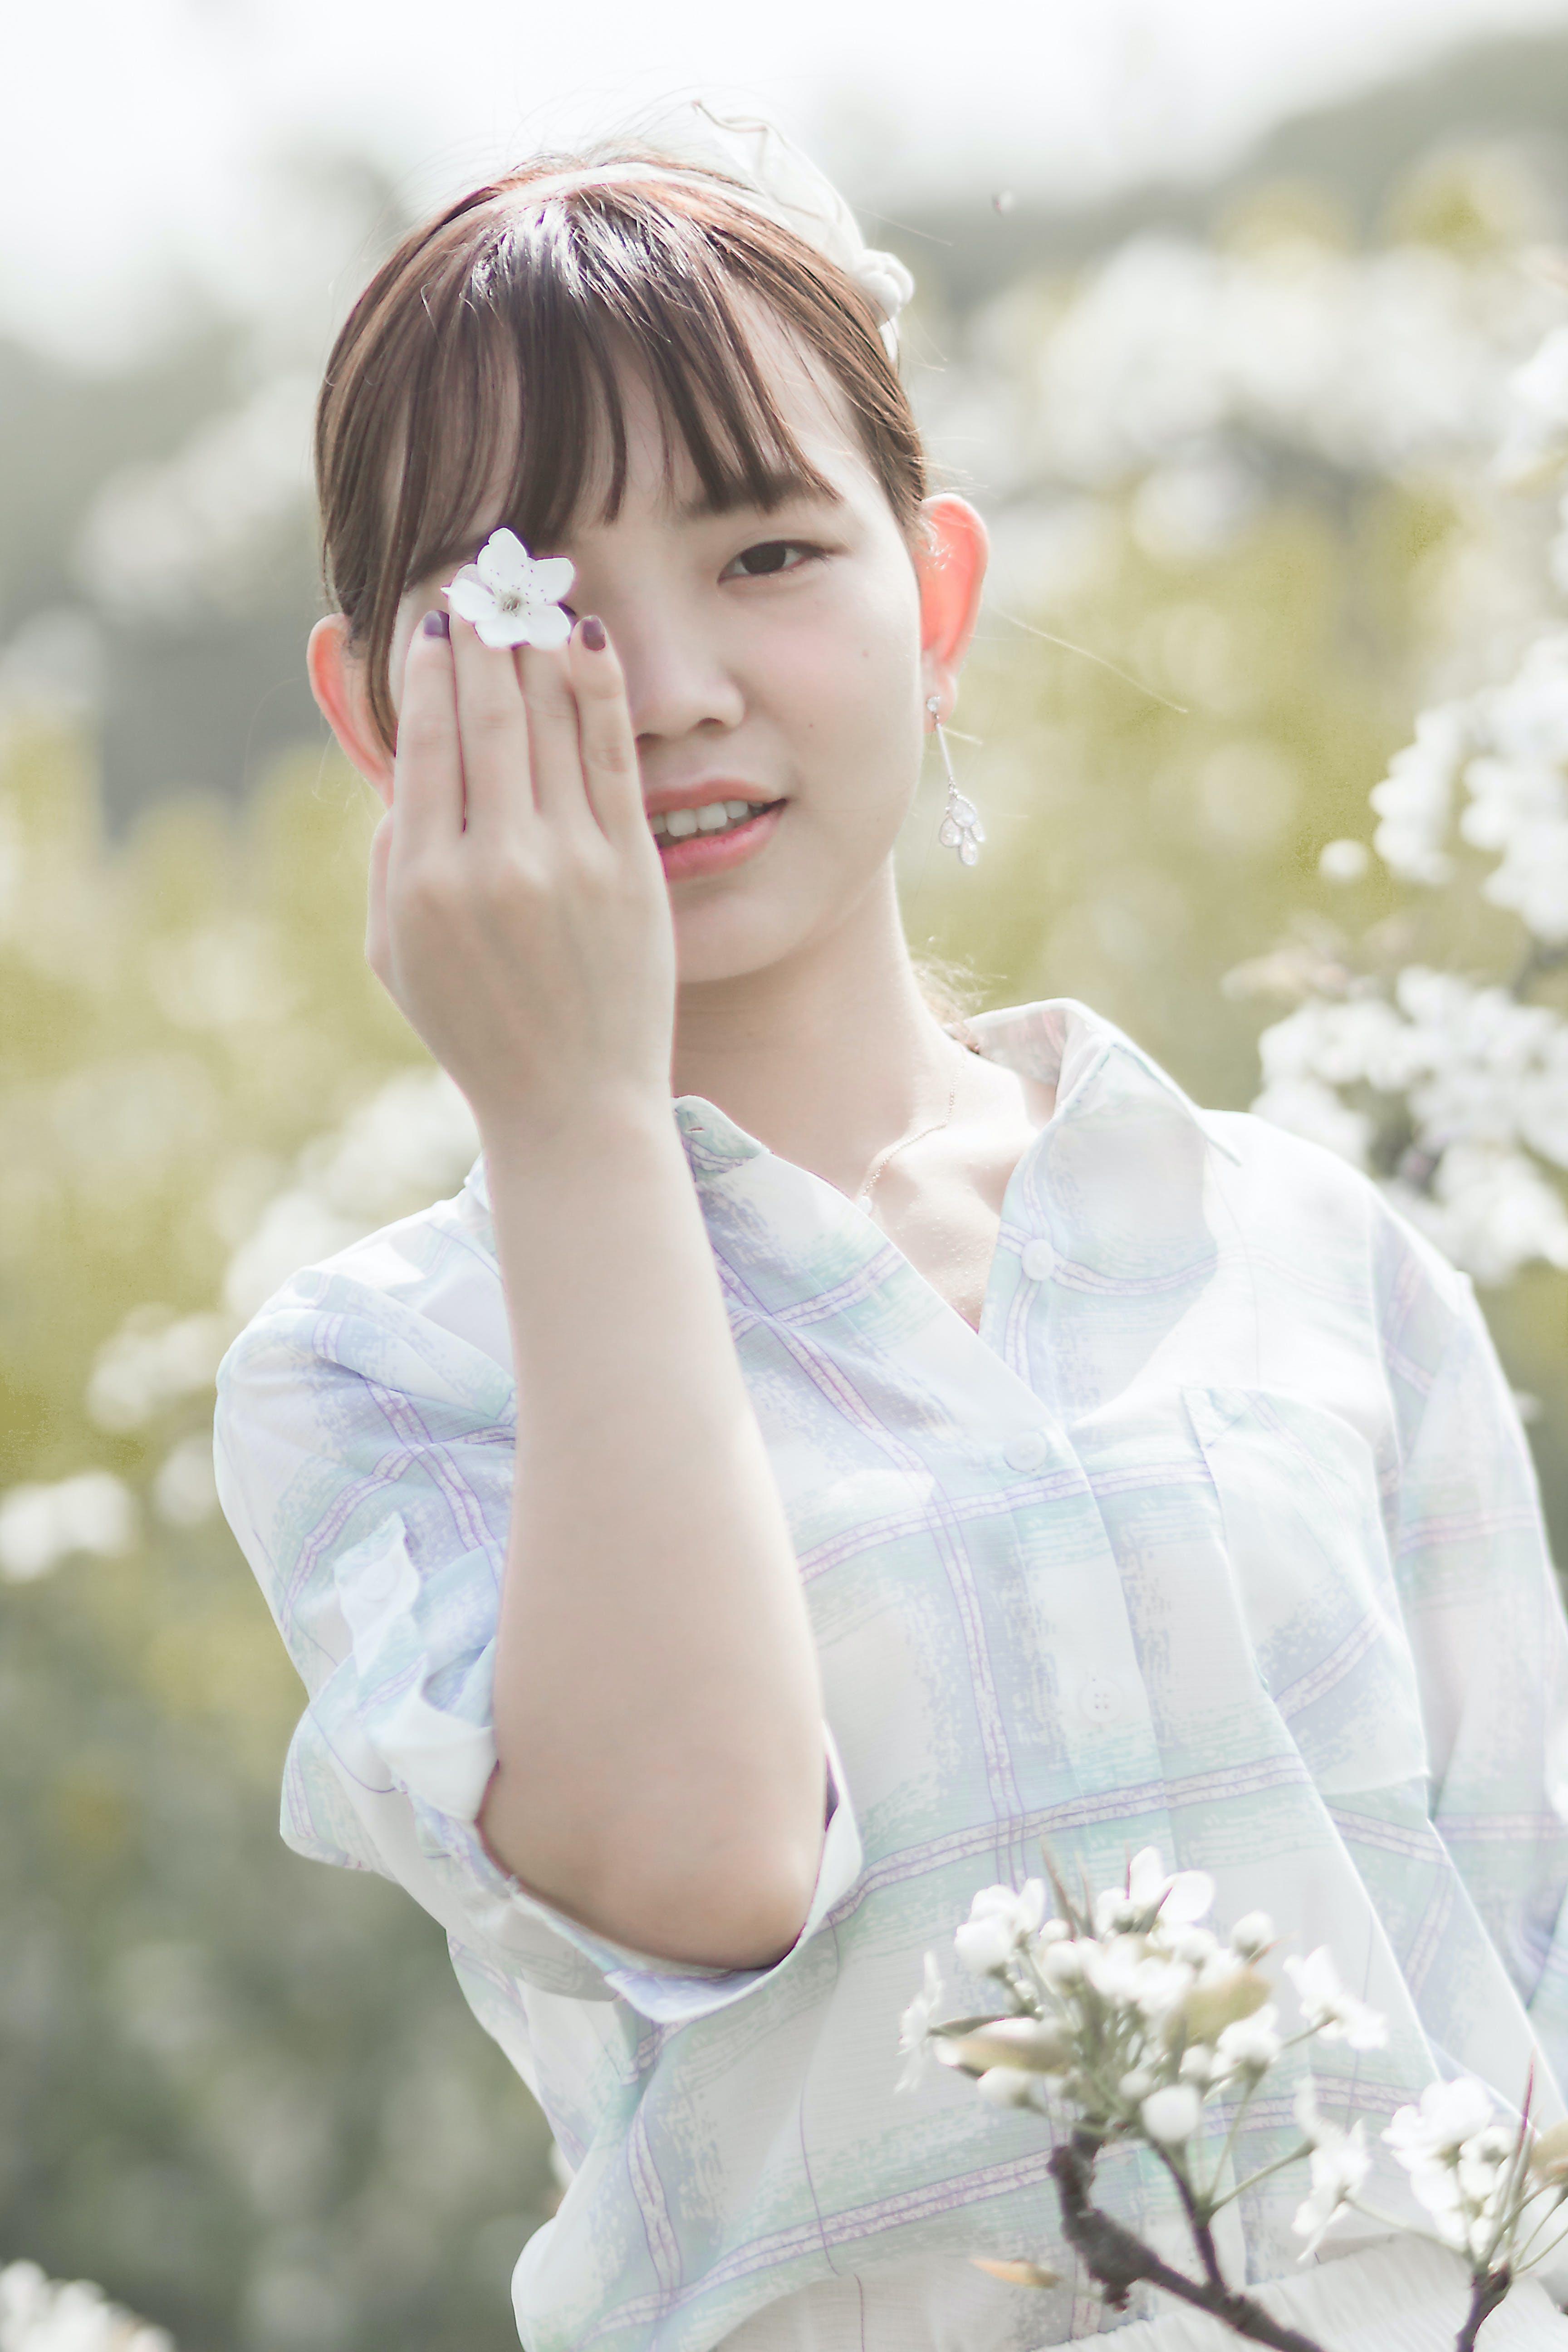 Woman Holding White Cherry Blossom Flower